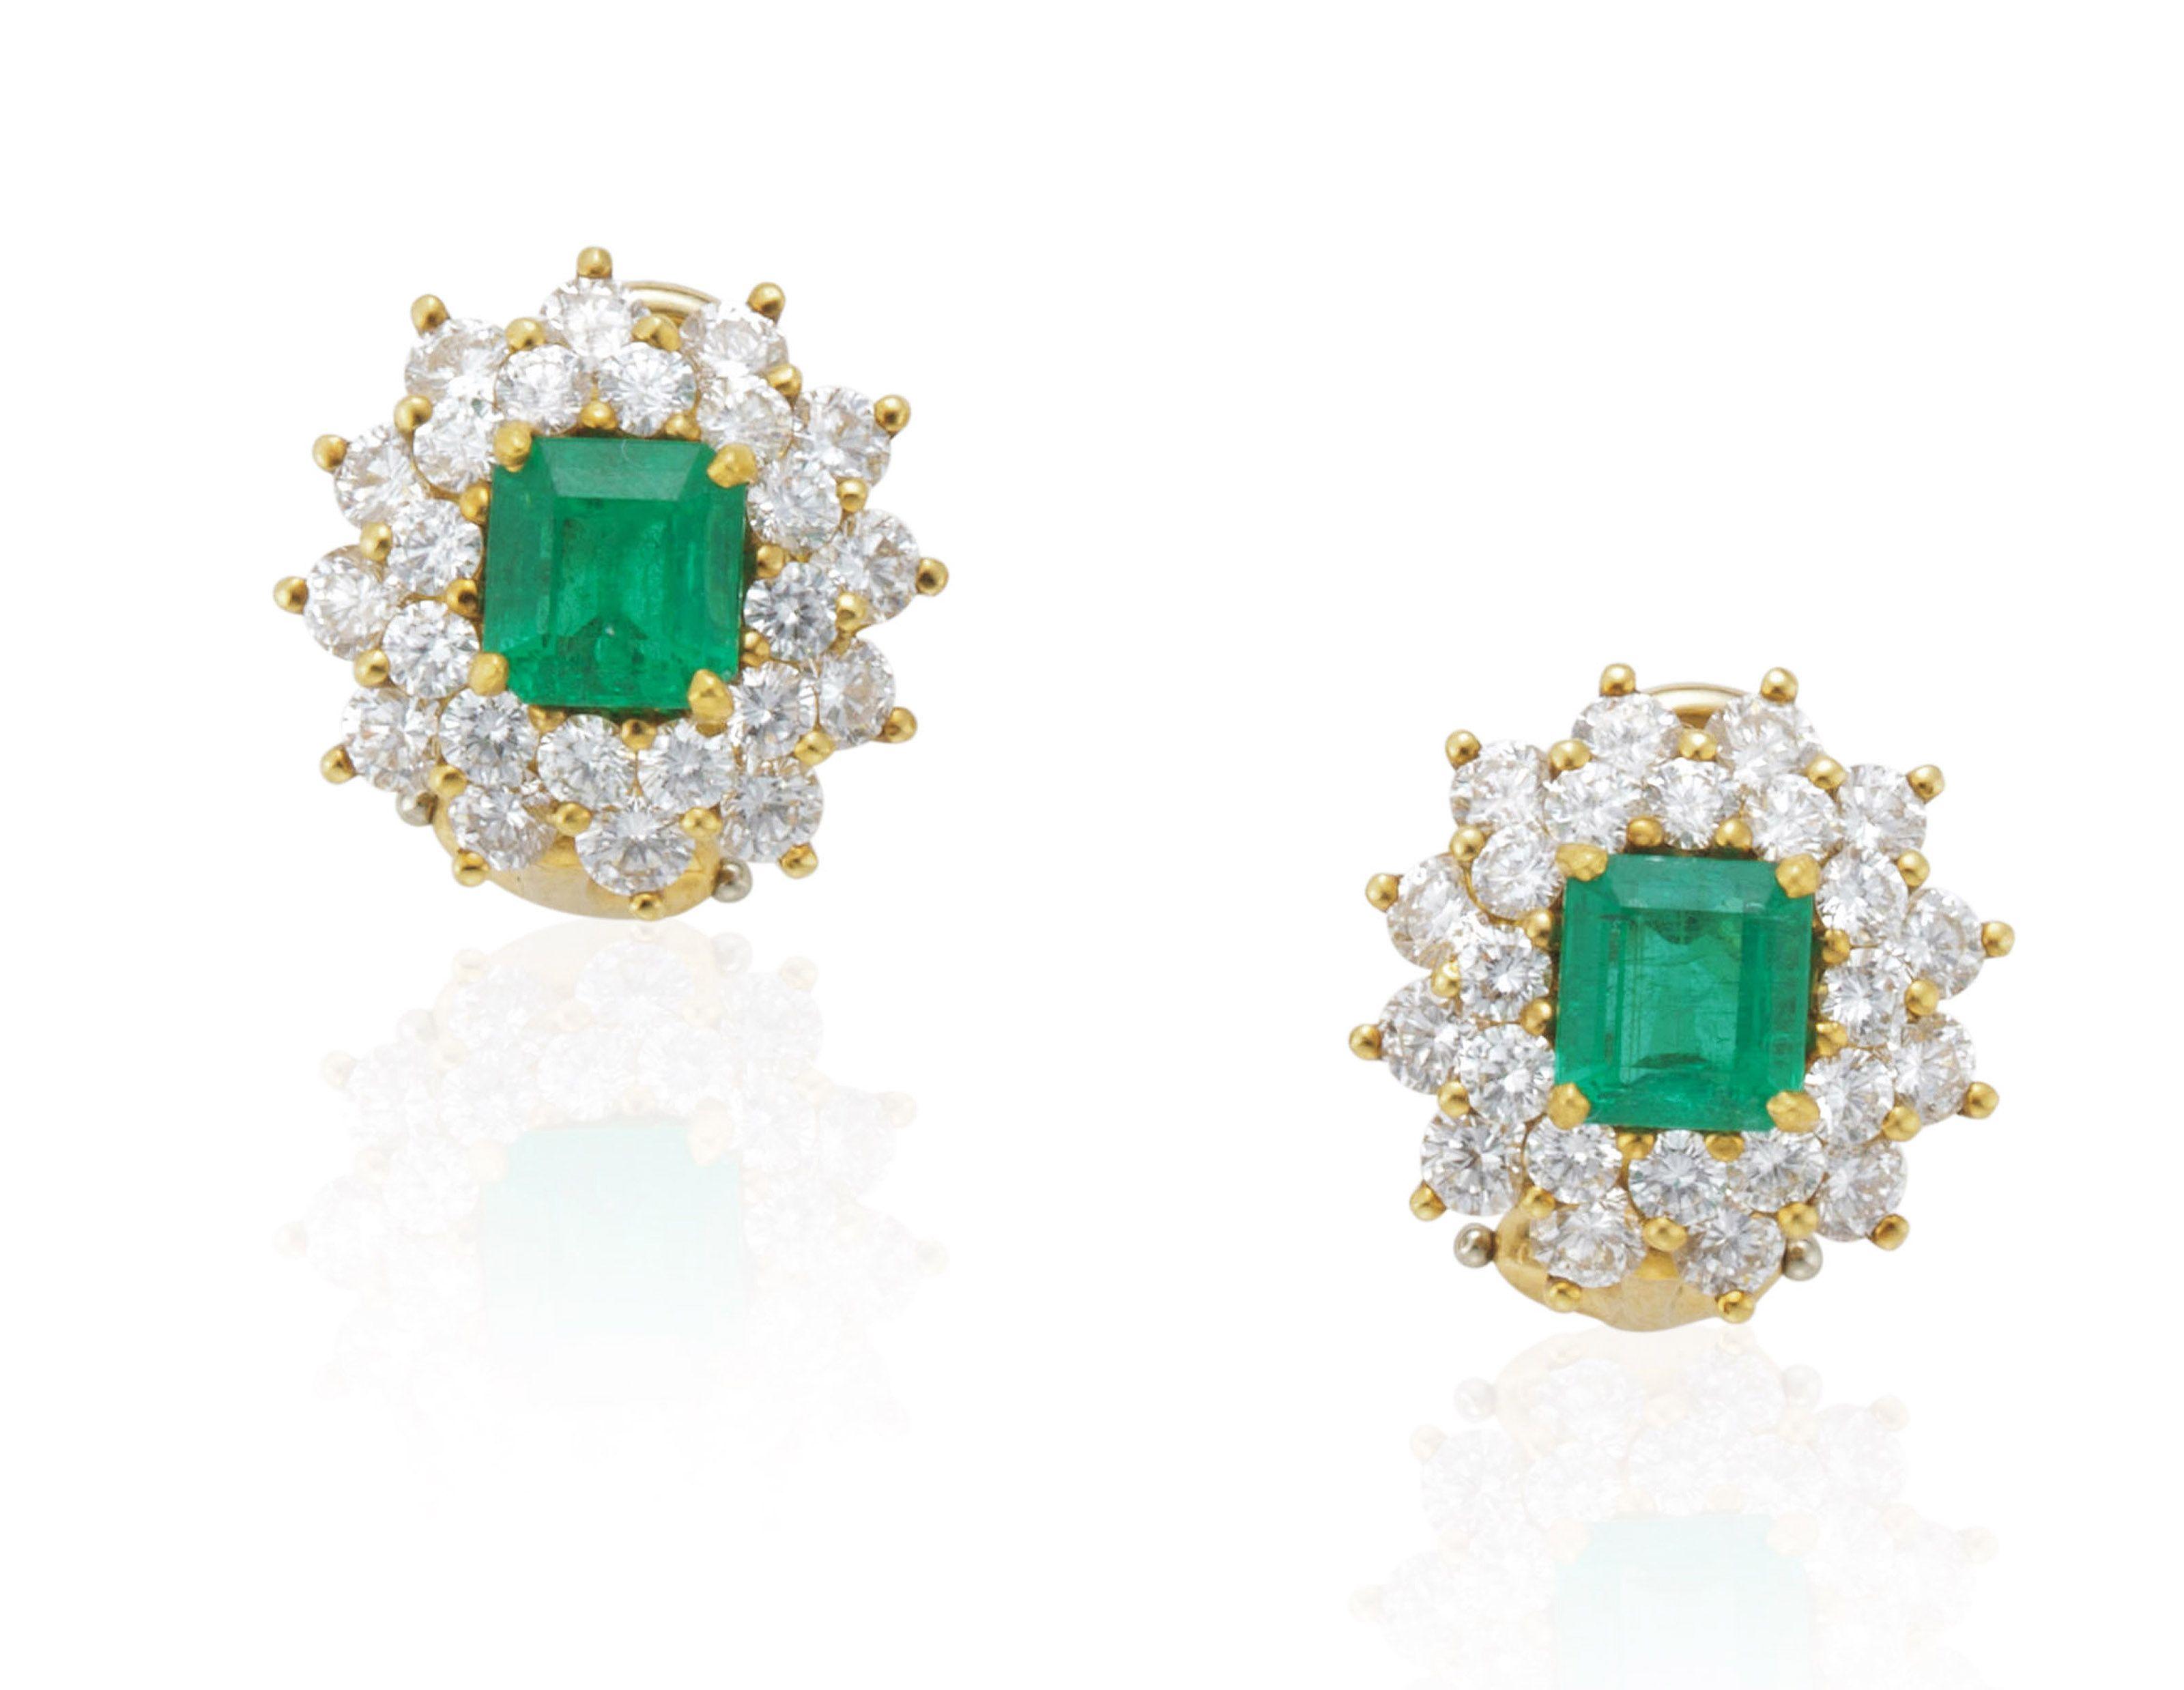 Tiffany & co emerald and diamond earrings